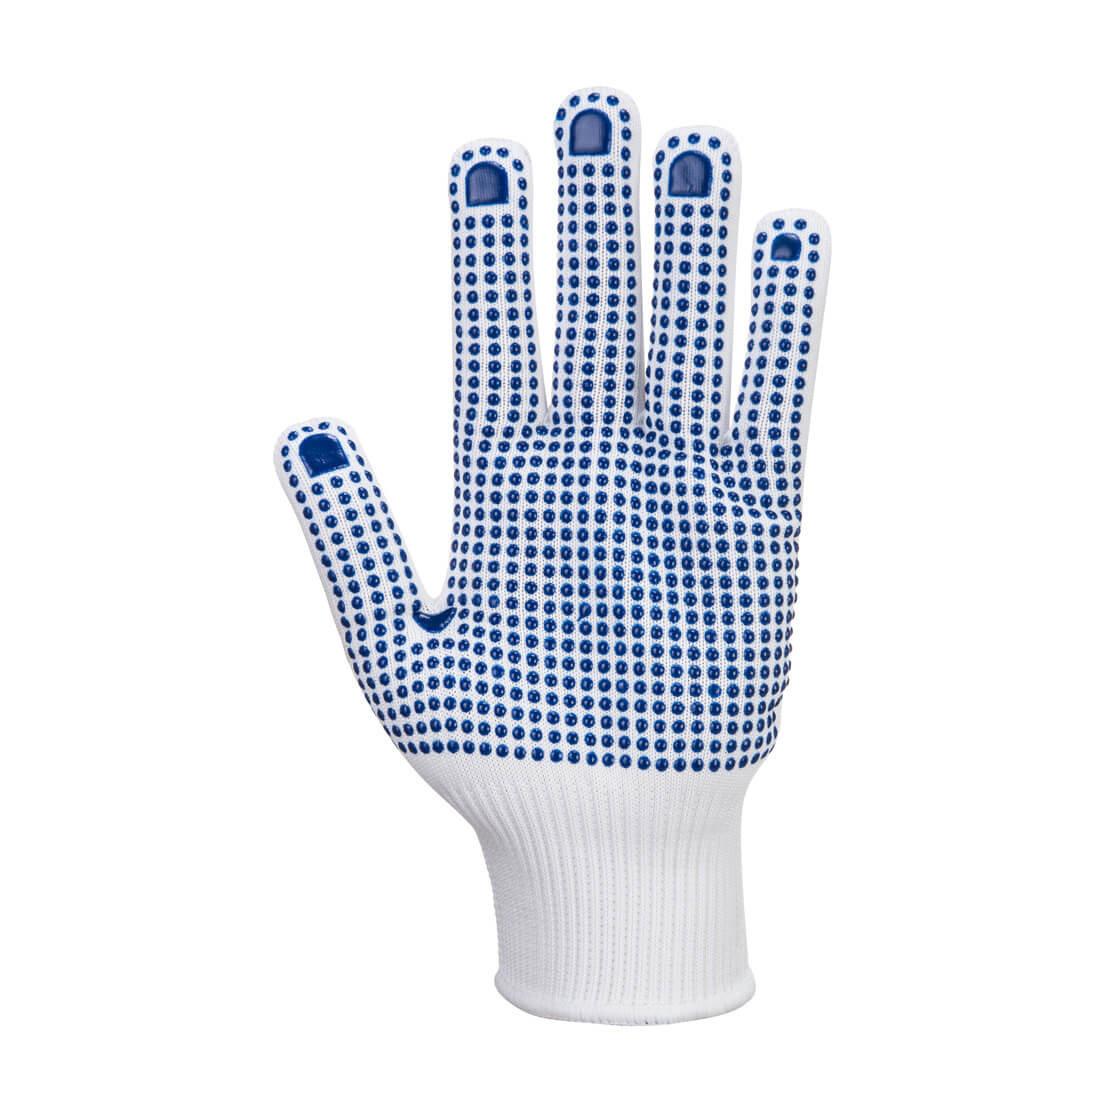 Manusa Nylon Polka Dot - Echipamente de protectie personala